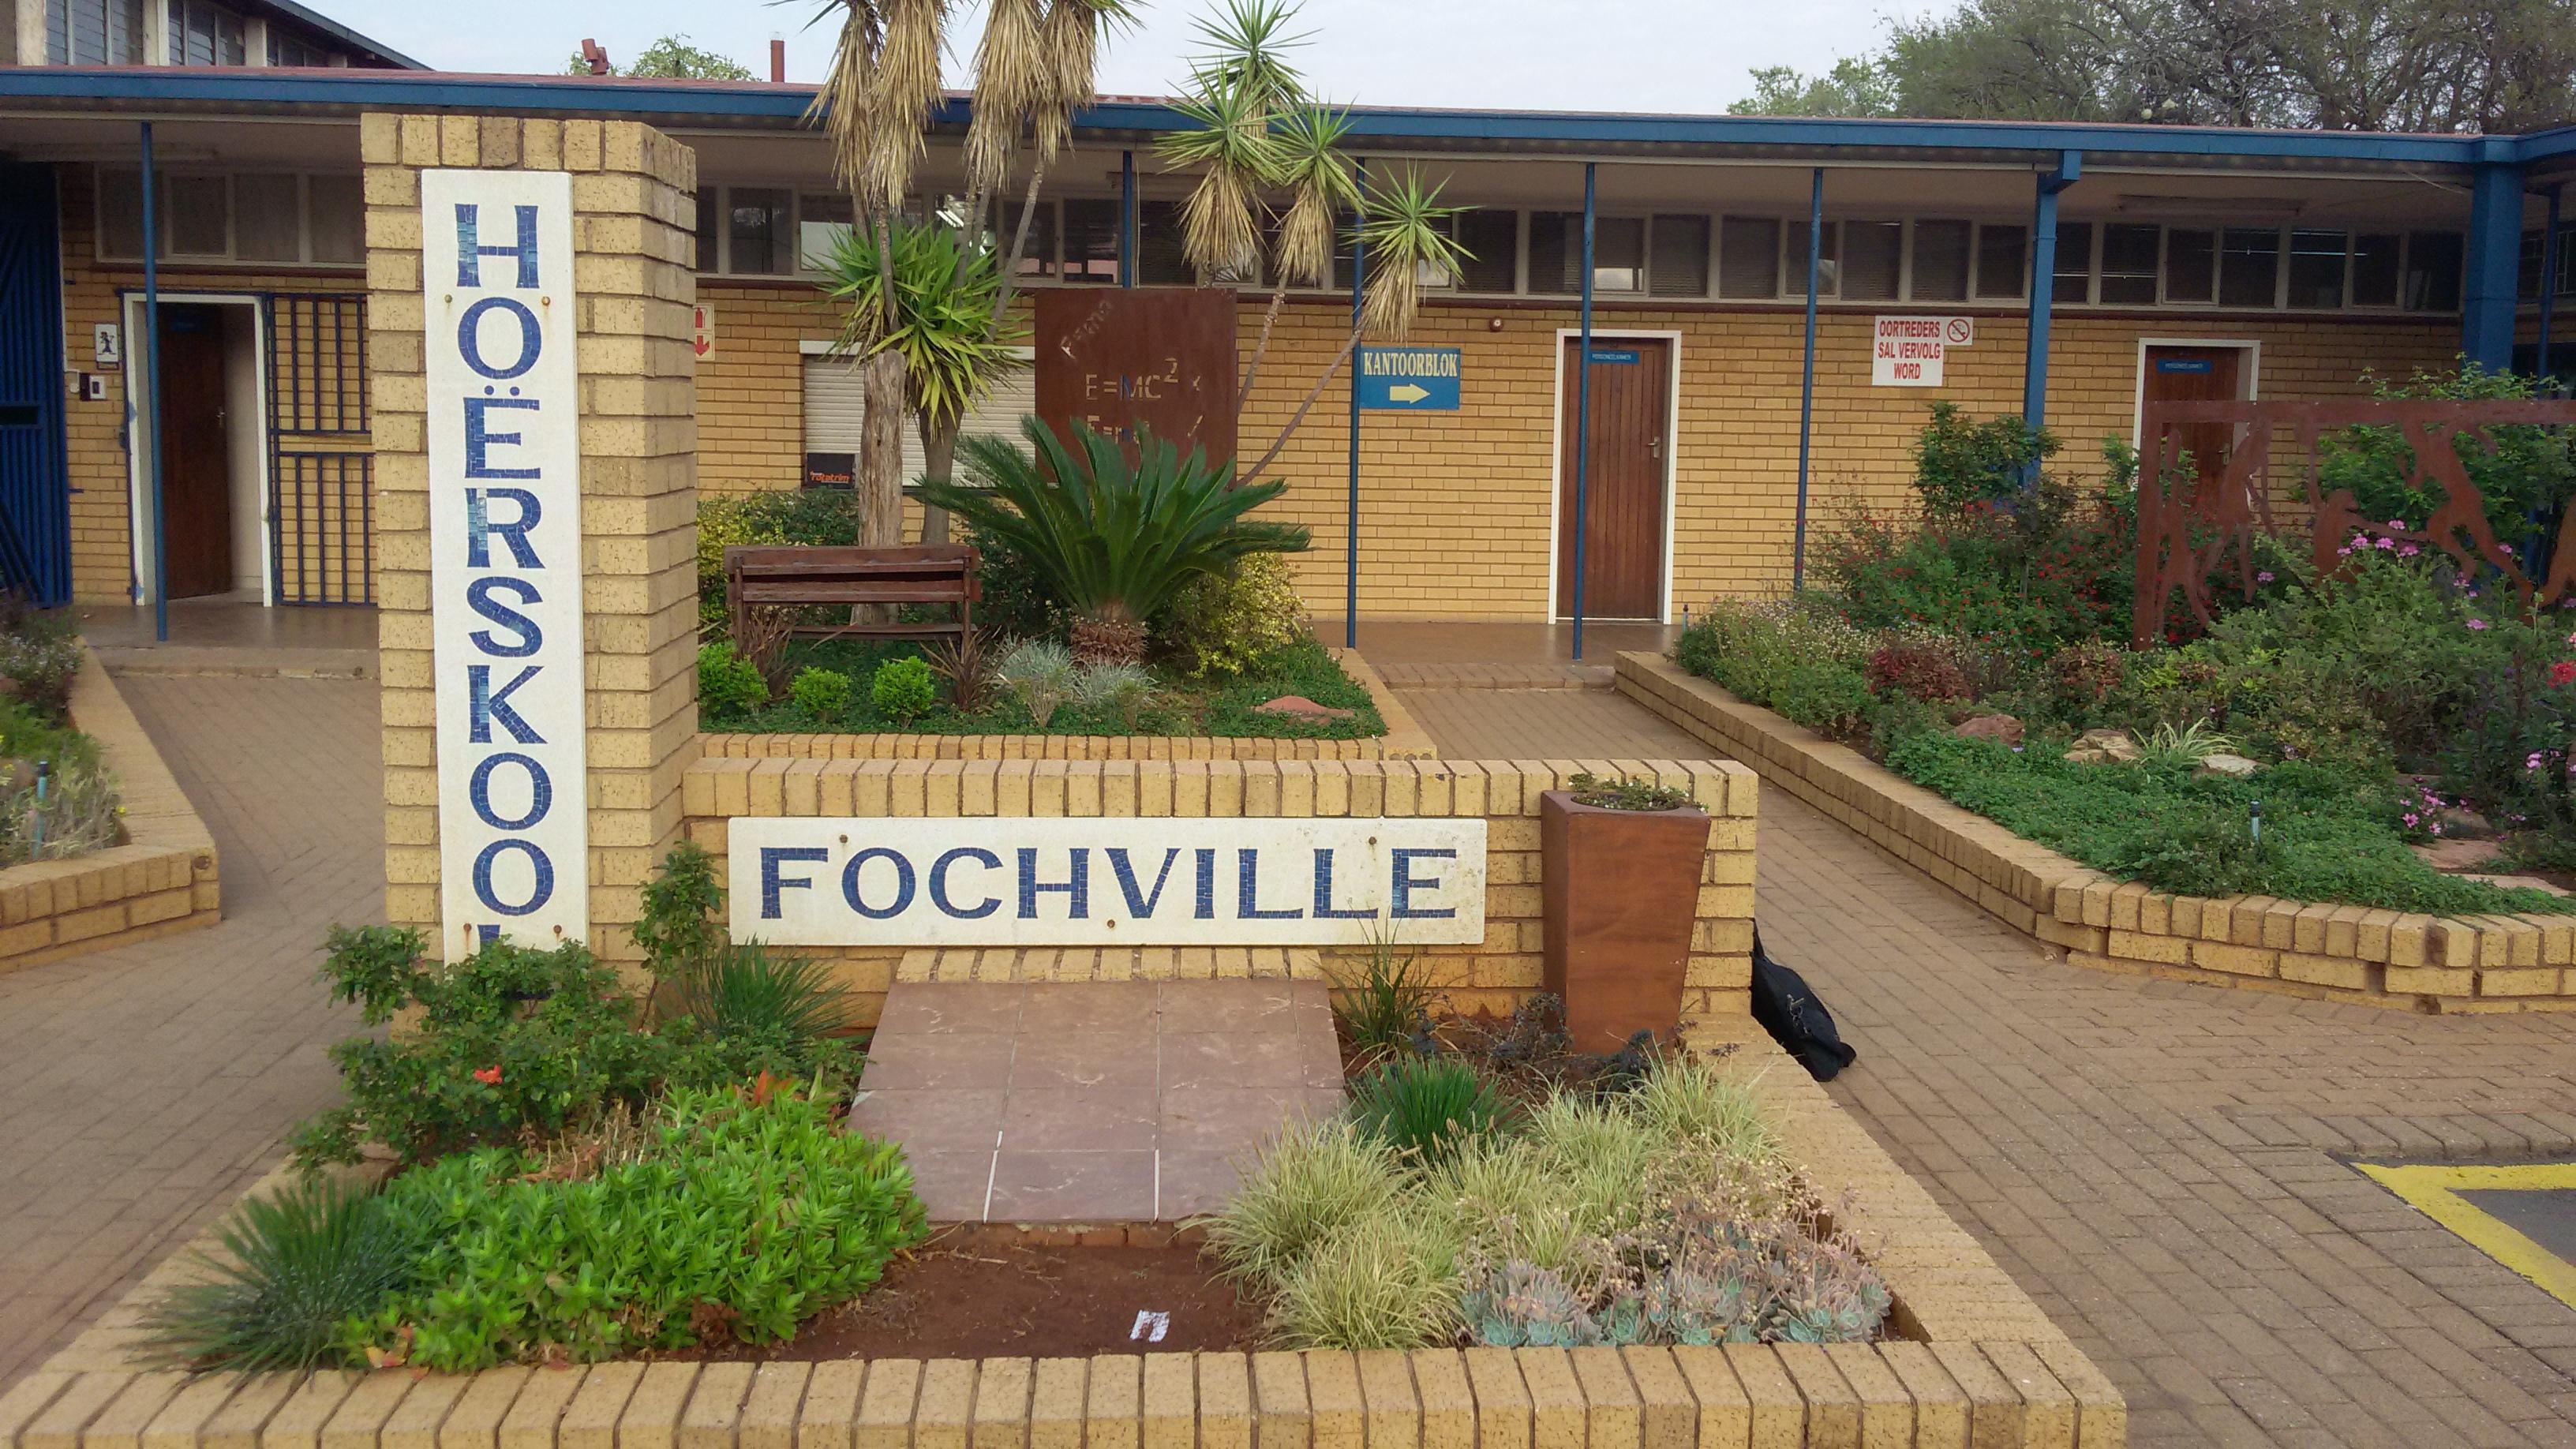 Hoërskool Fochville.